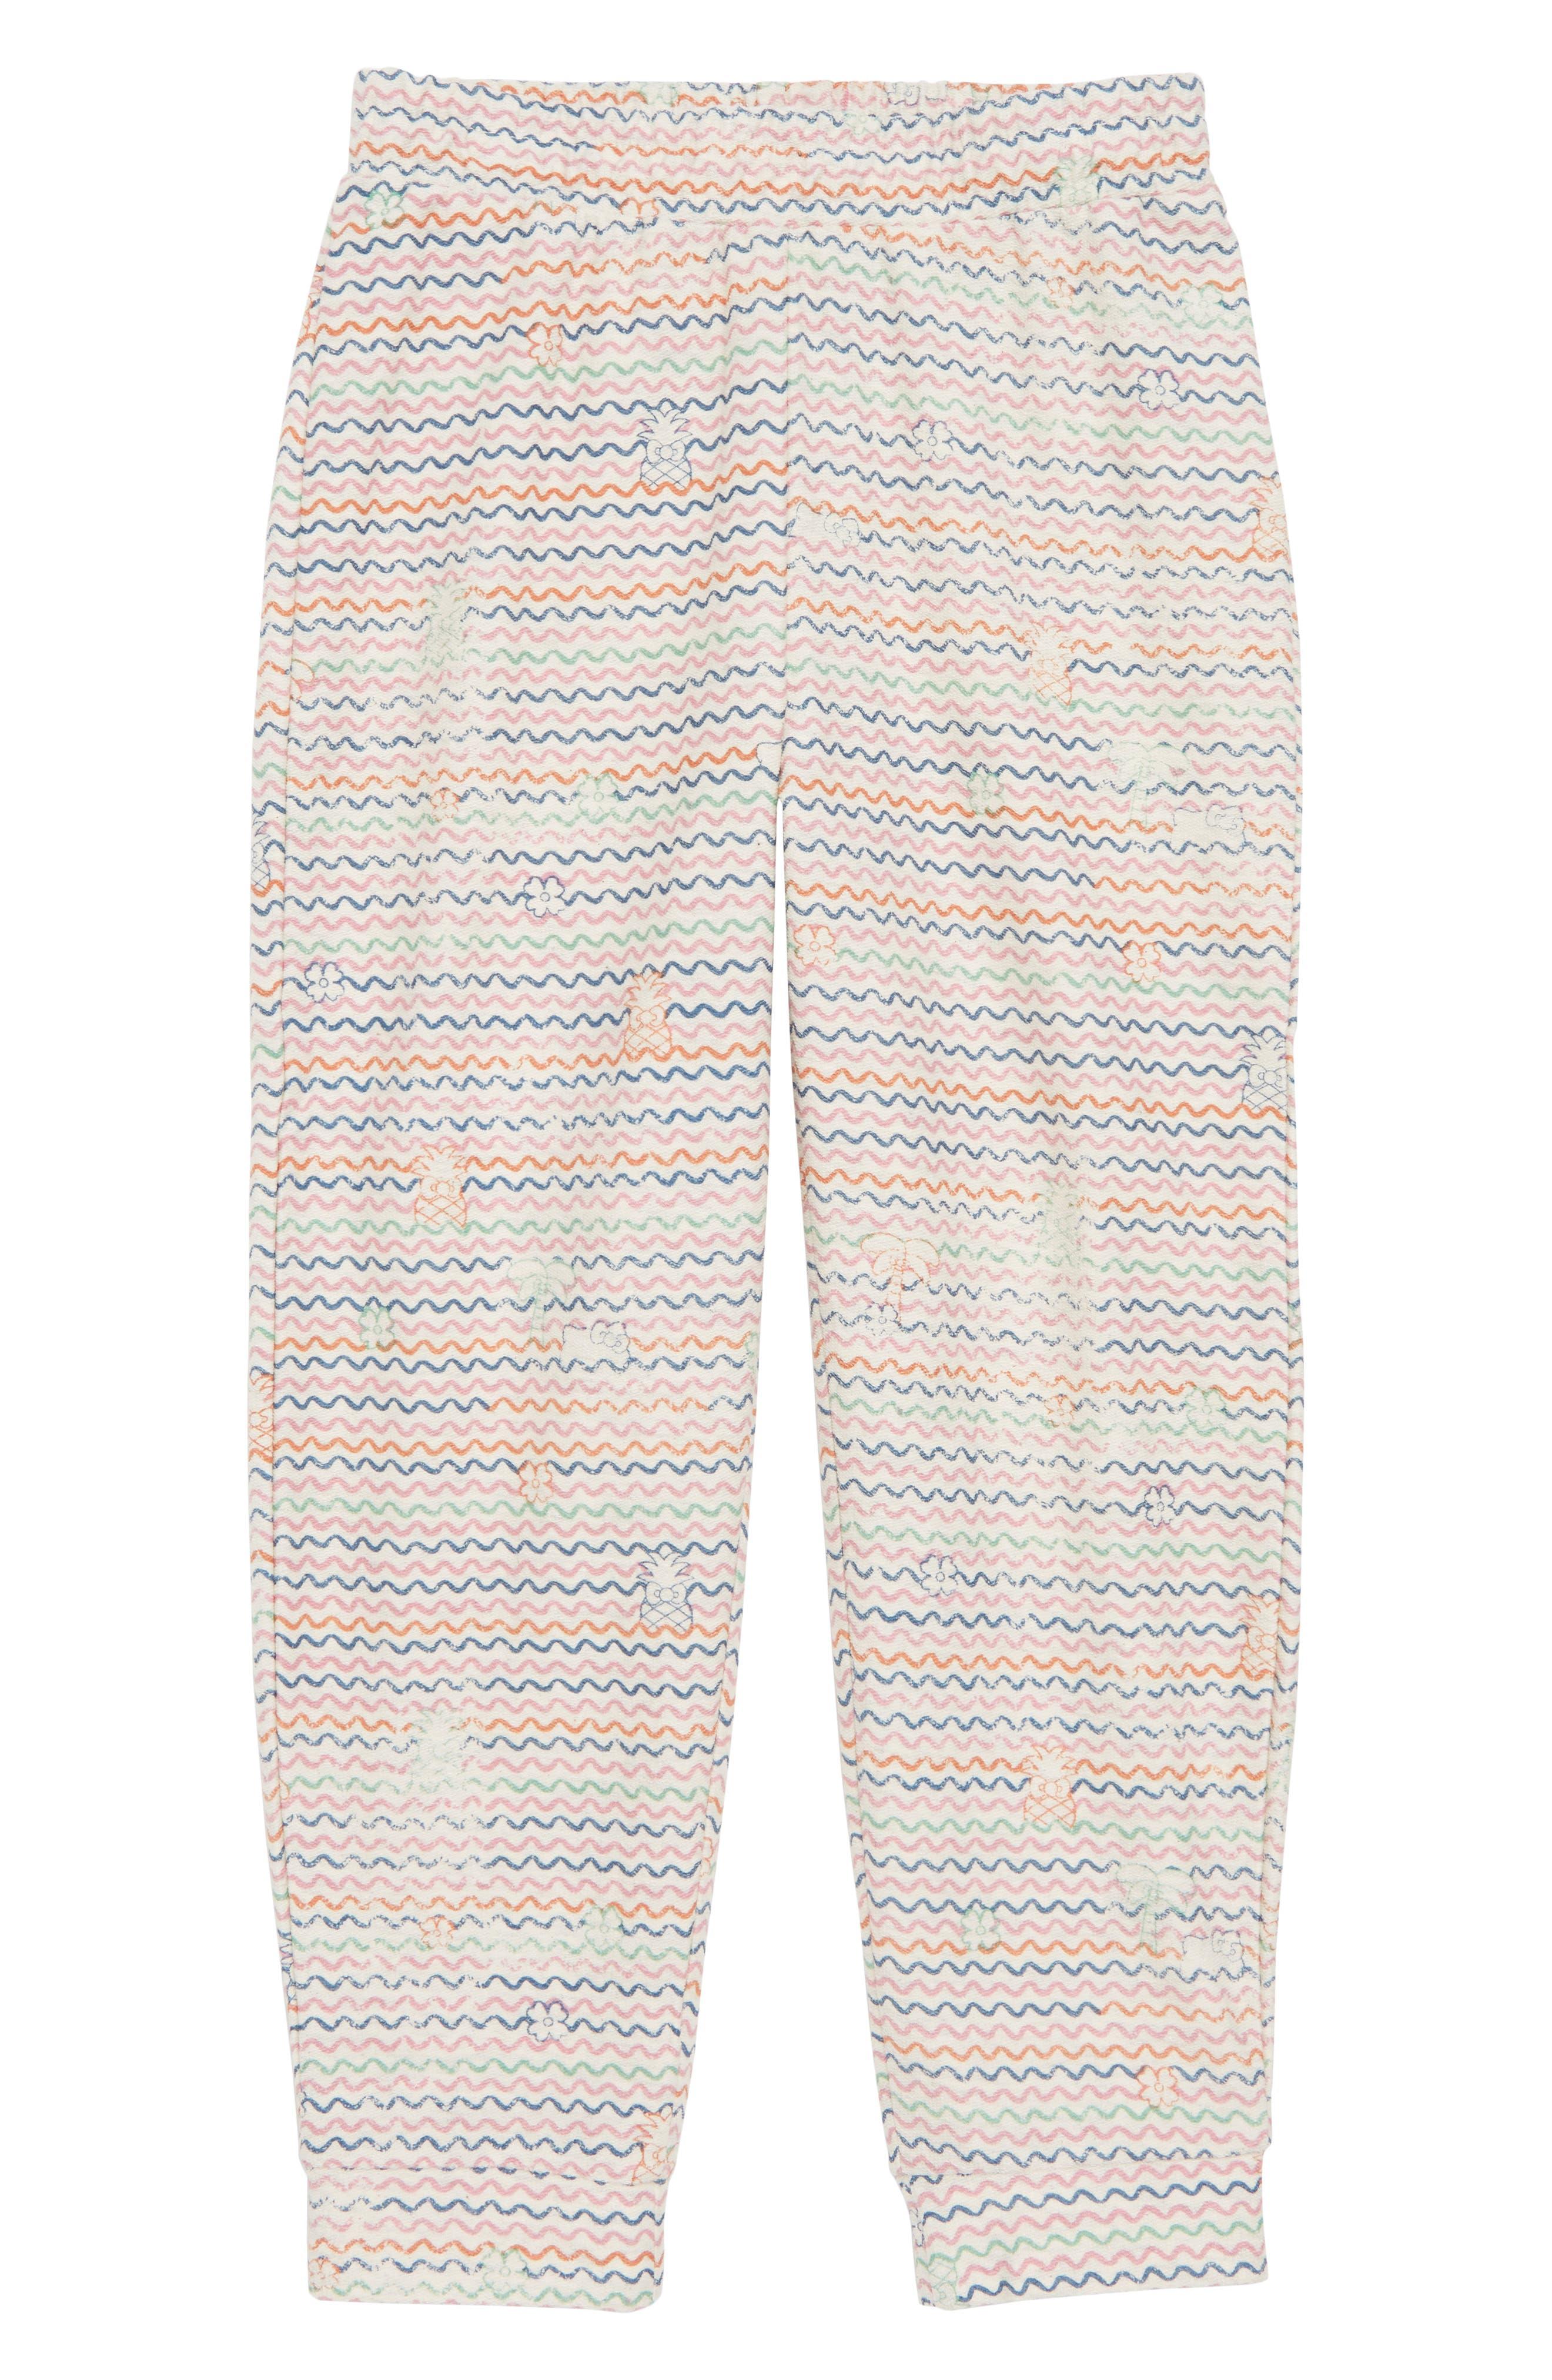 x Hello Kitty<sup>®</sup> Tropical Treasures Fleece Pants,                         Main,                         color, 250